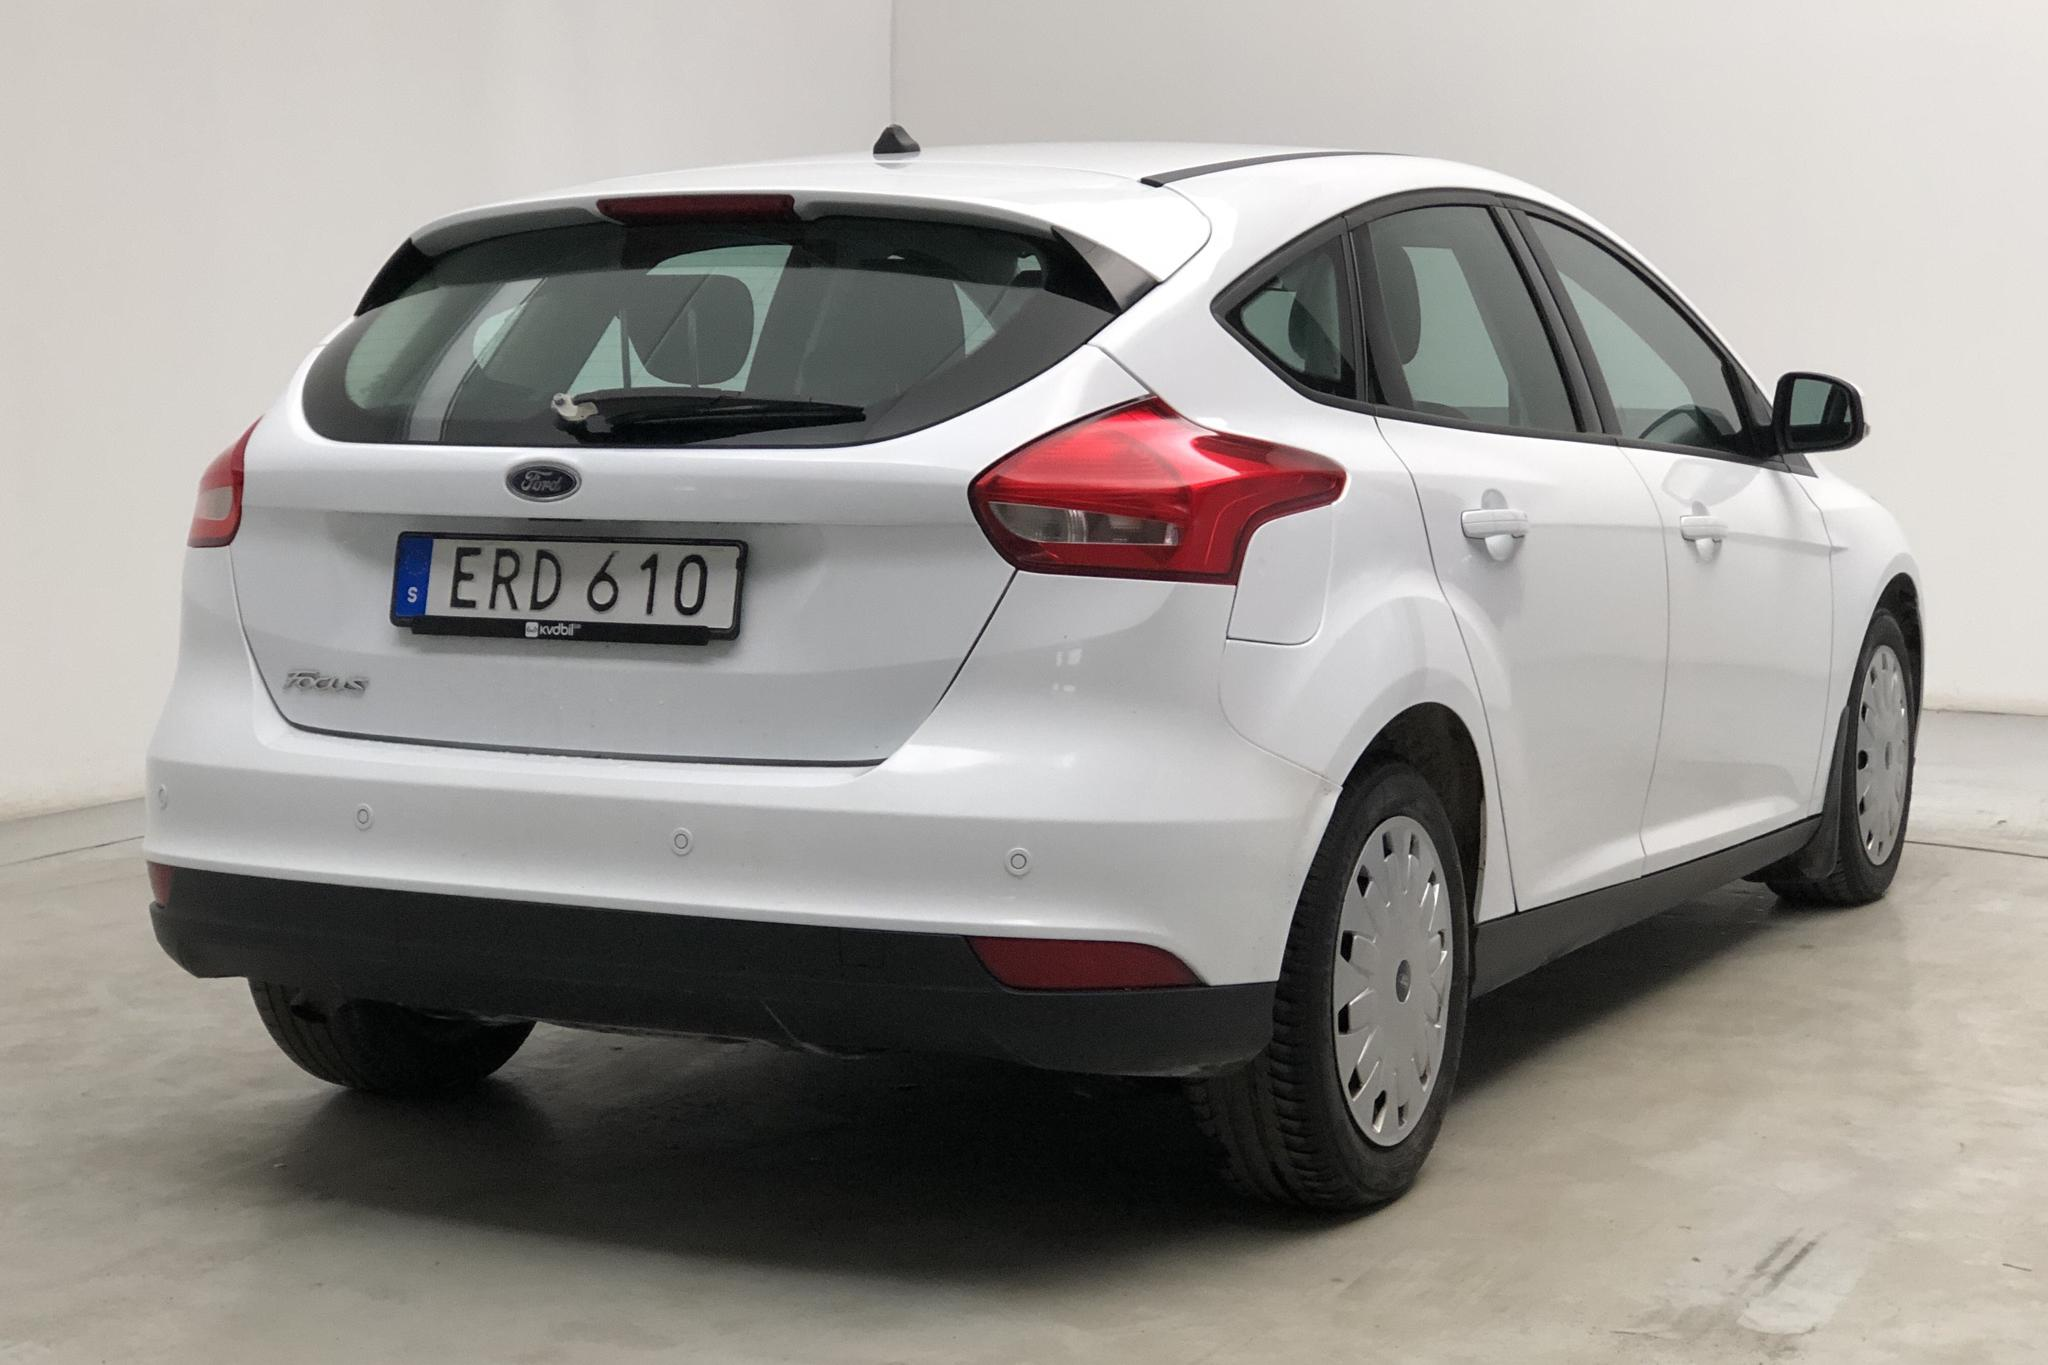 Ford Focus 1.5 TDCi ECOnetic 5dr (105hk) - 17 897 mil - Manuell - vit - 2017